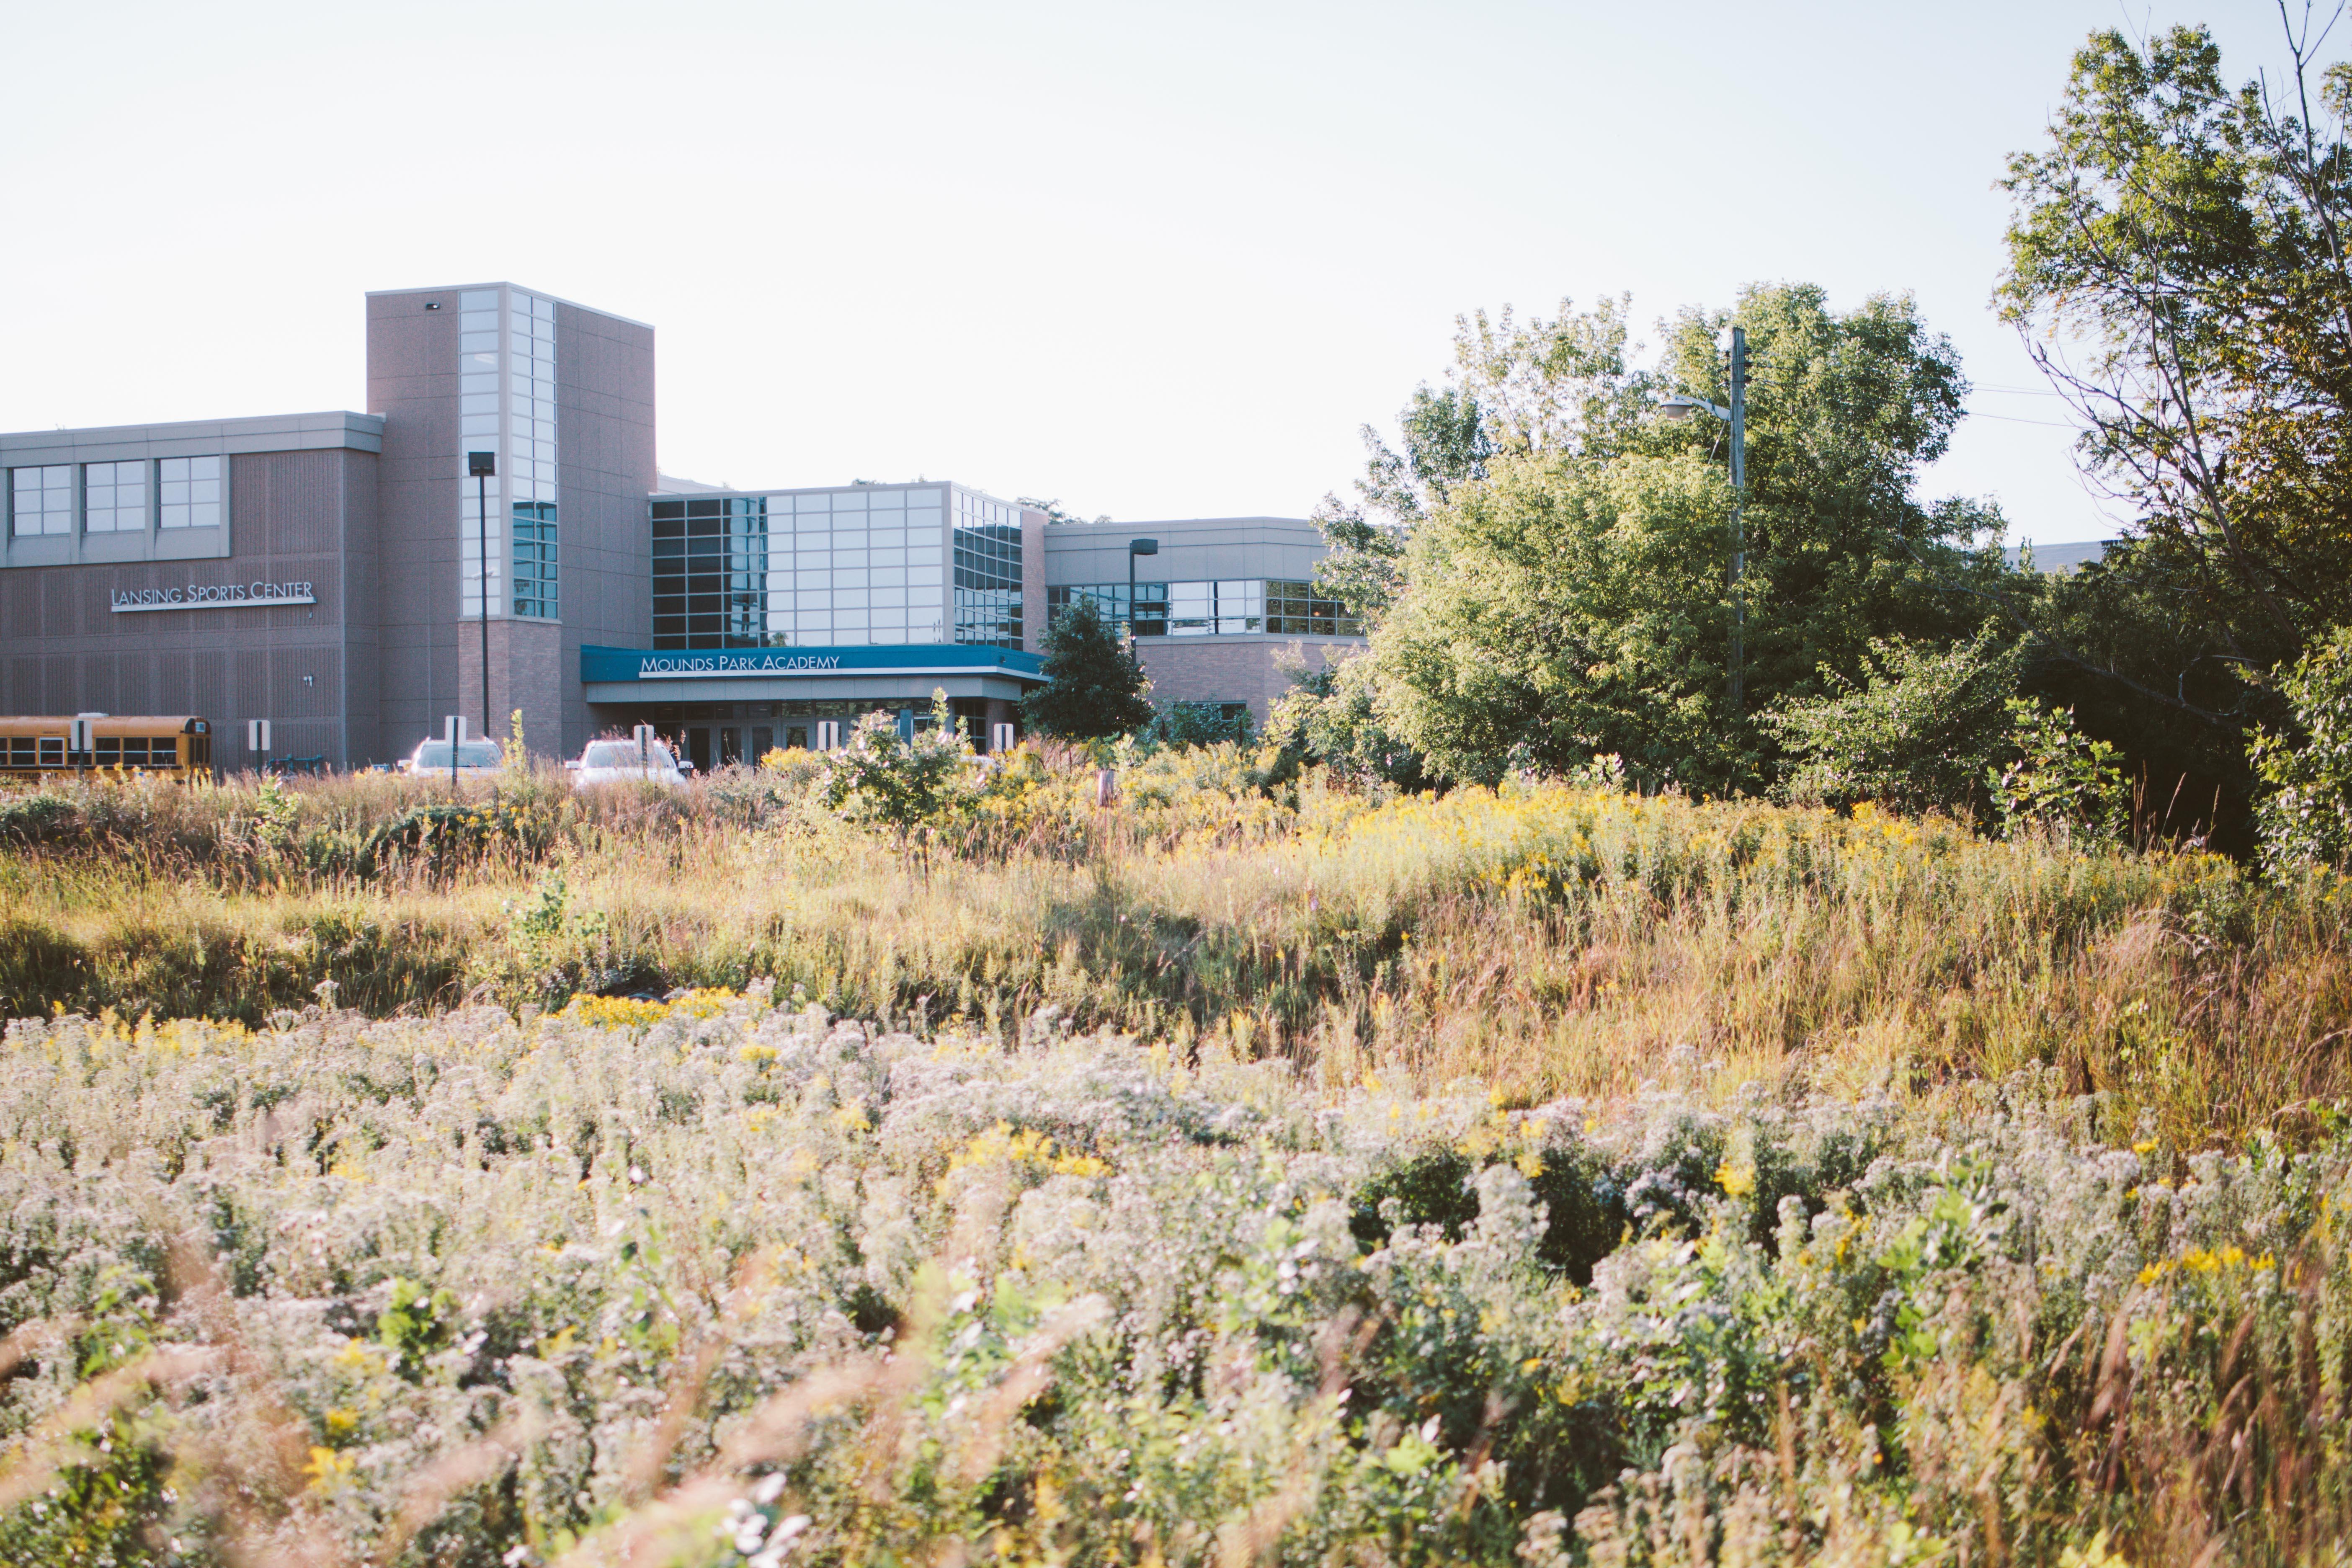 School - Mounds Park Academy  3